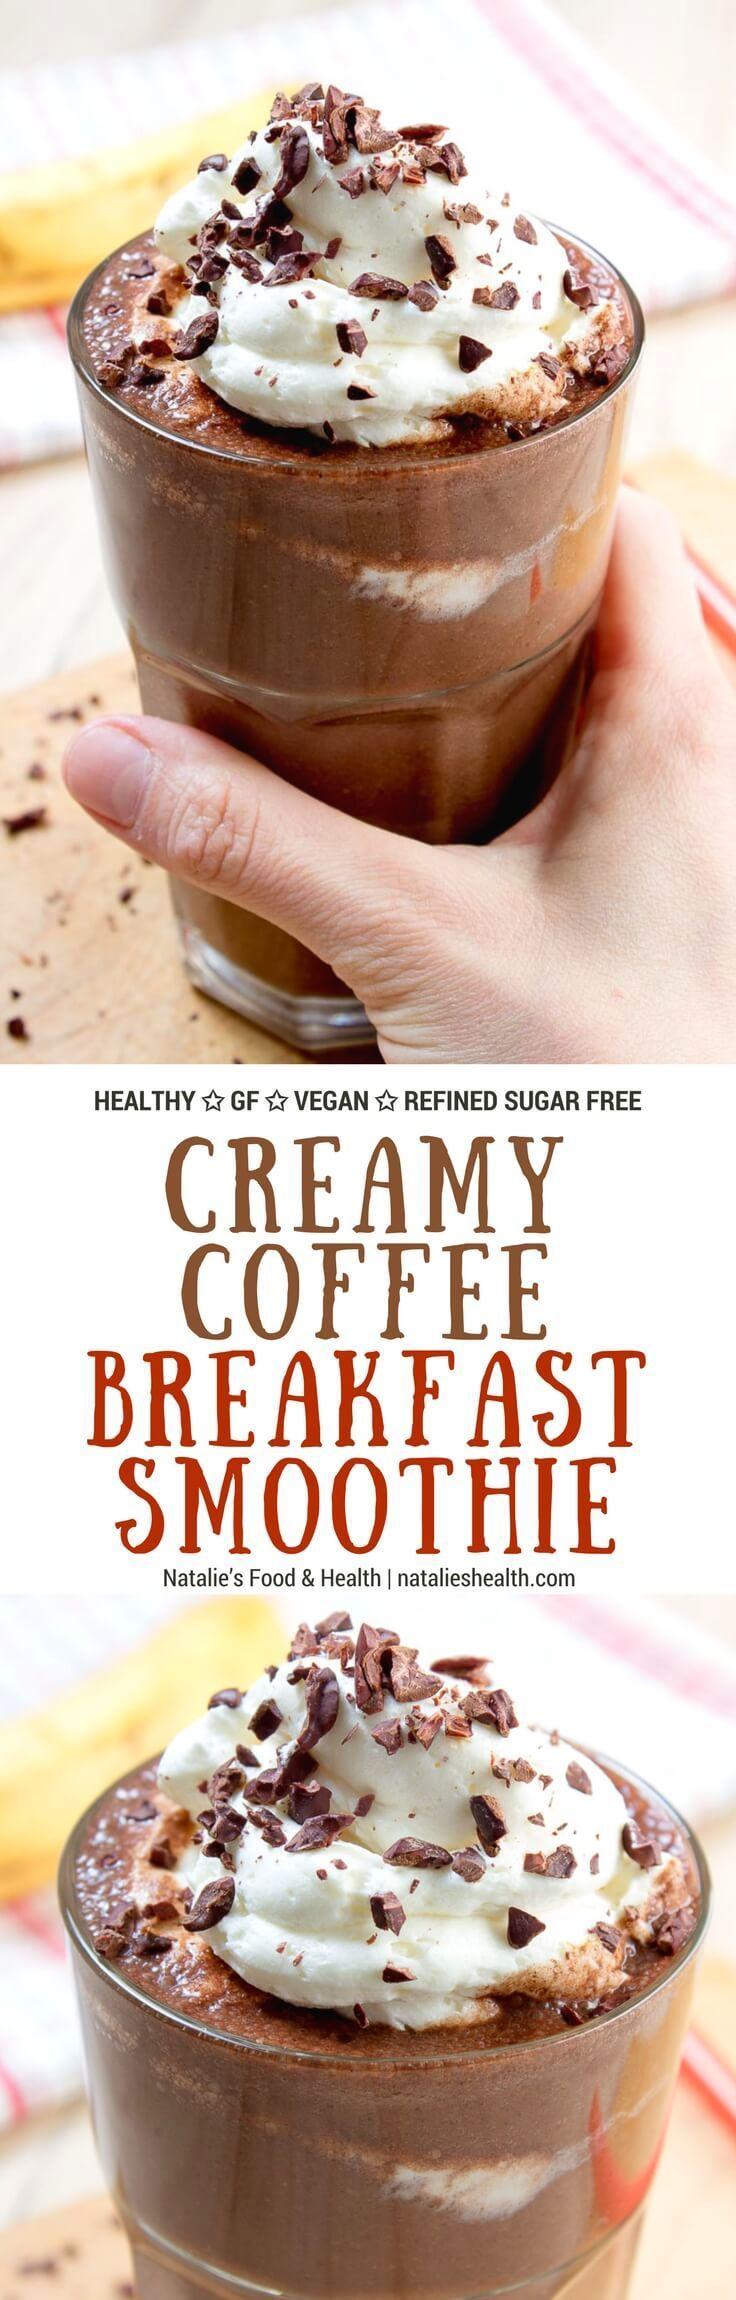 Coffee Breakfast Smoothie